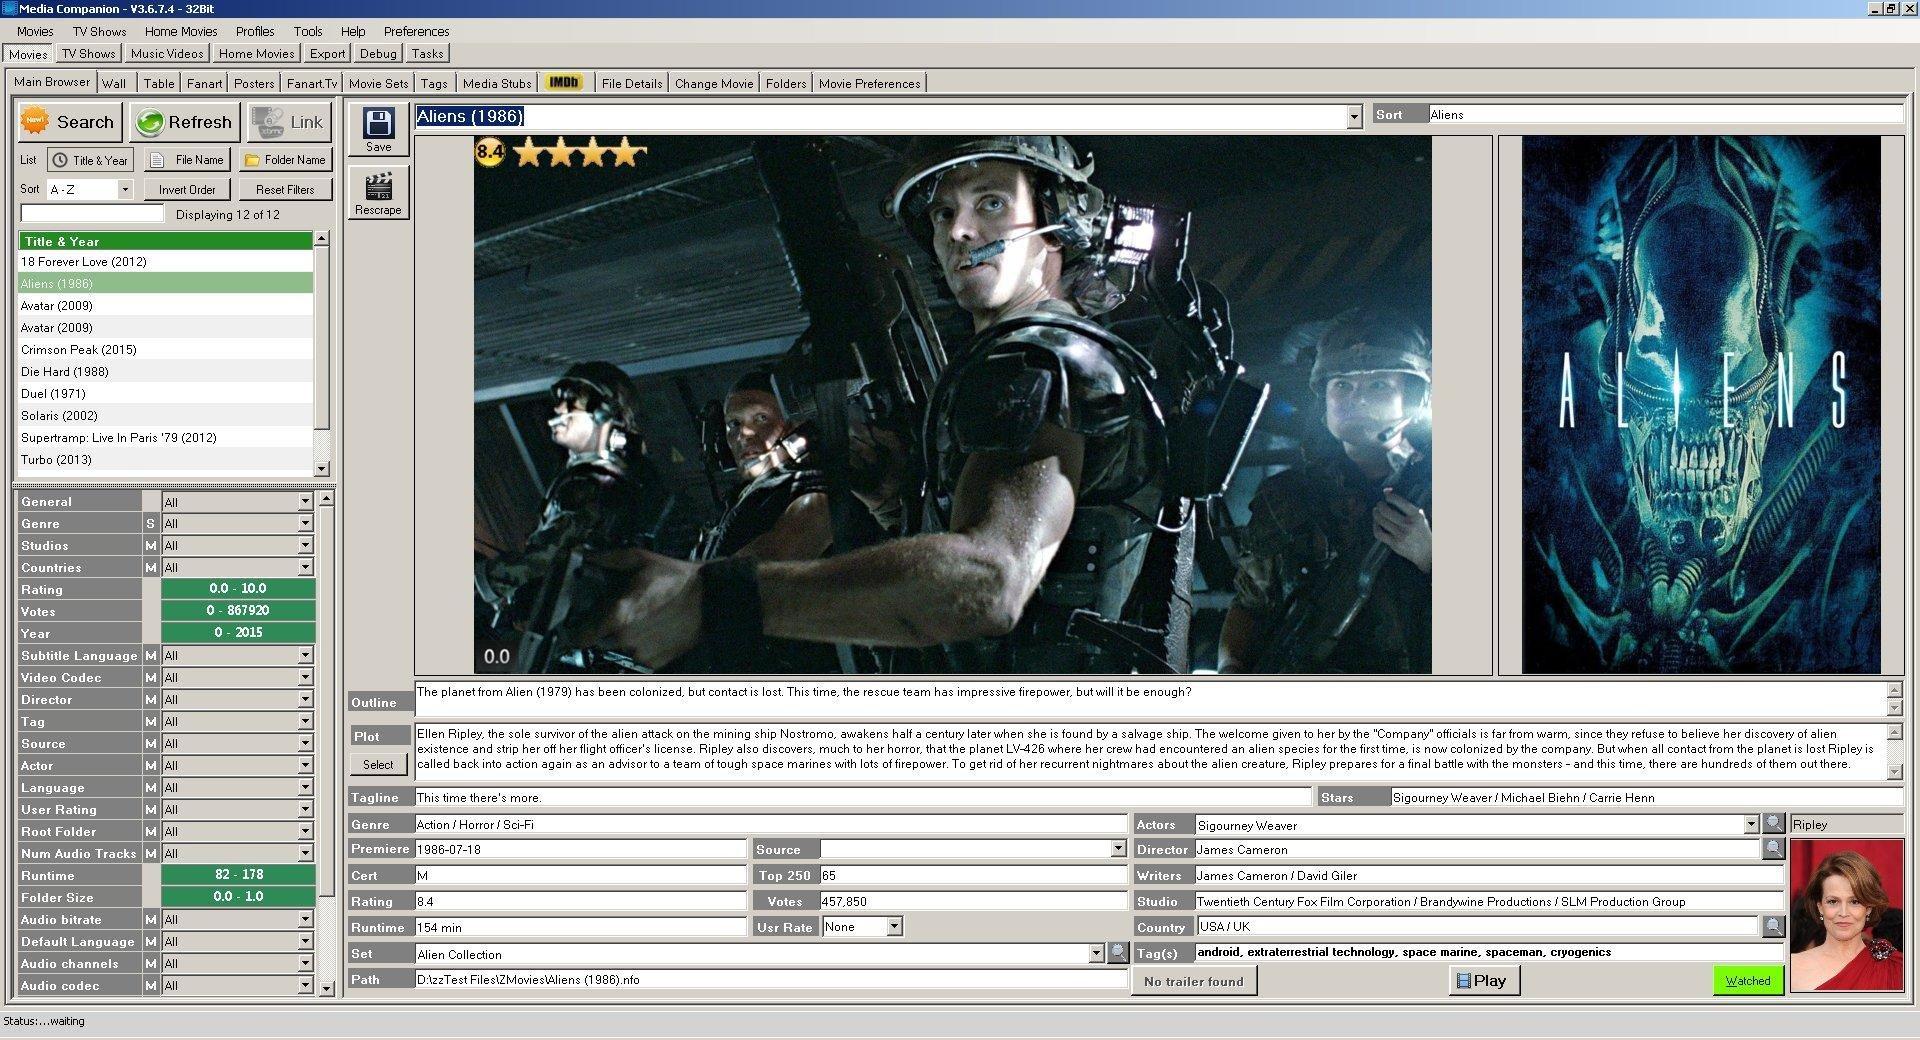 Full Media Companion screenshot